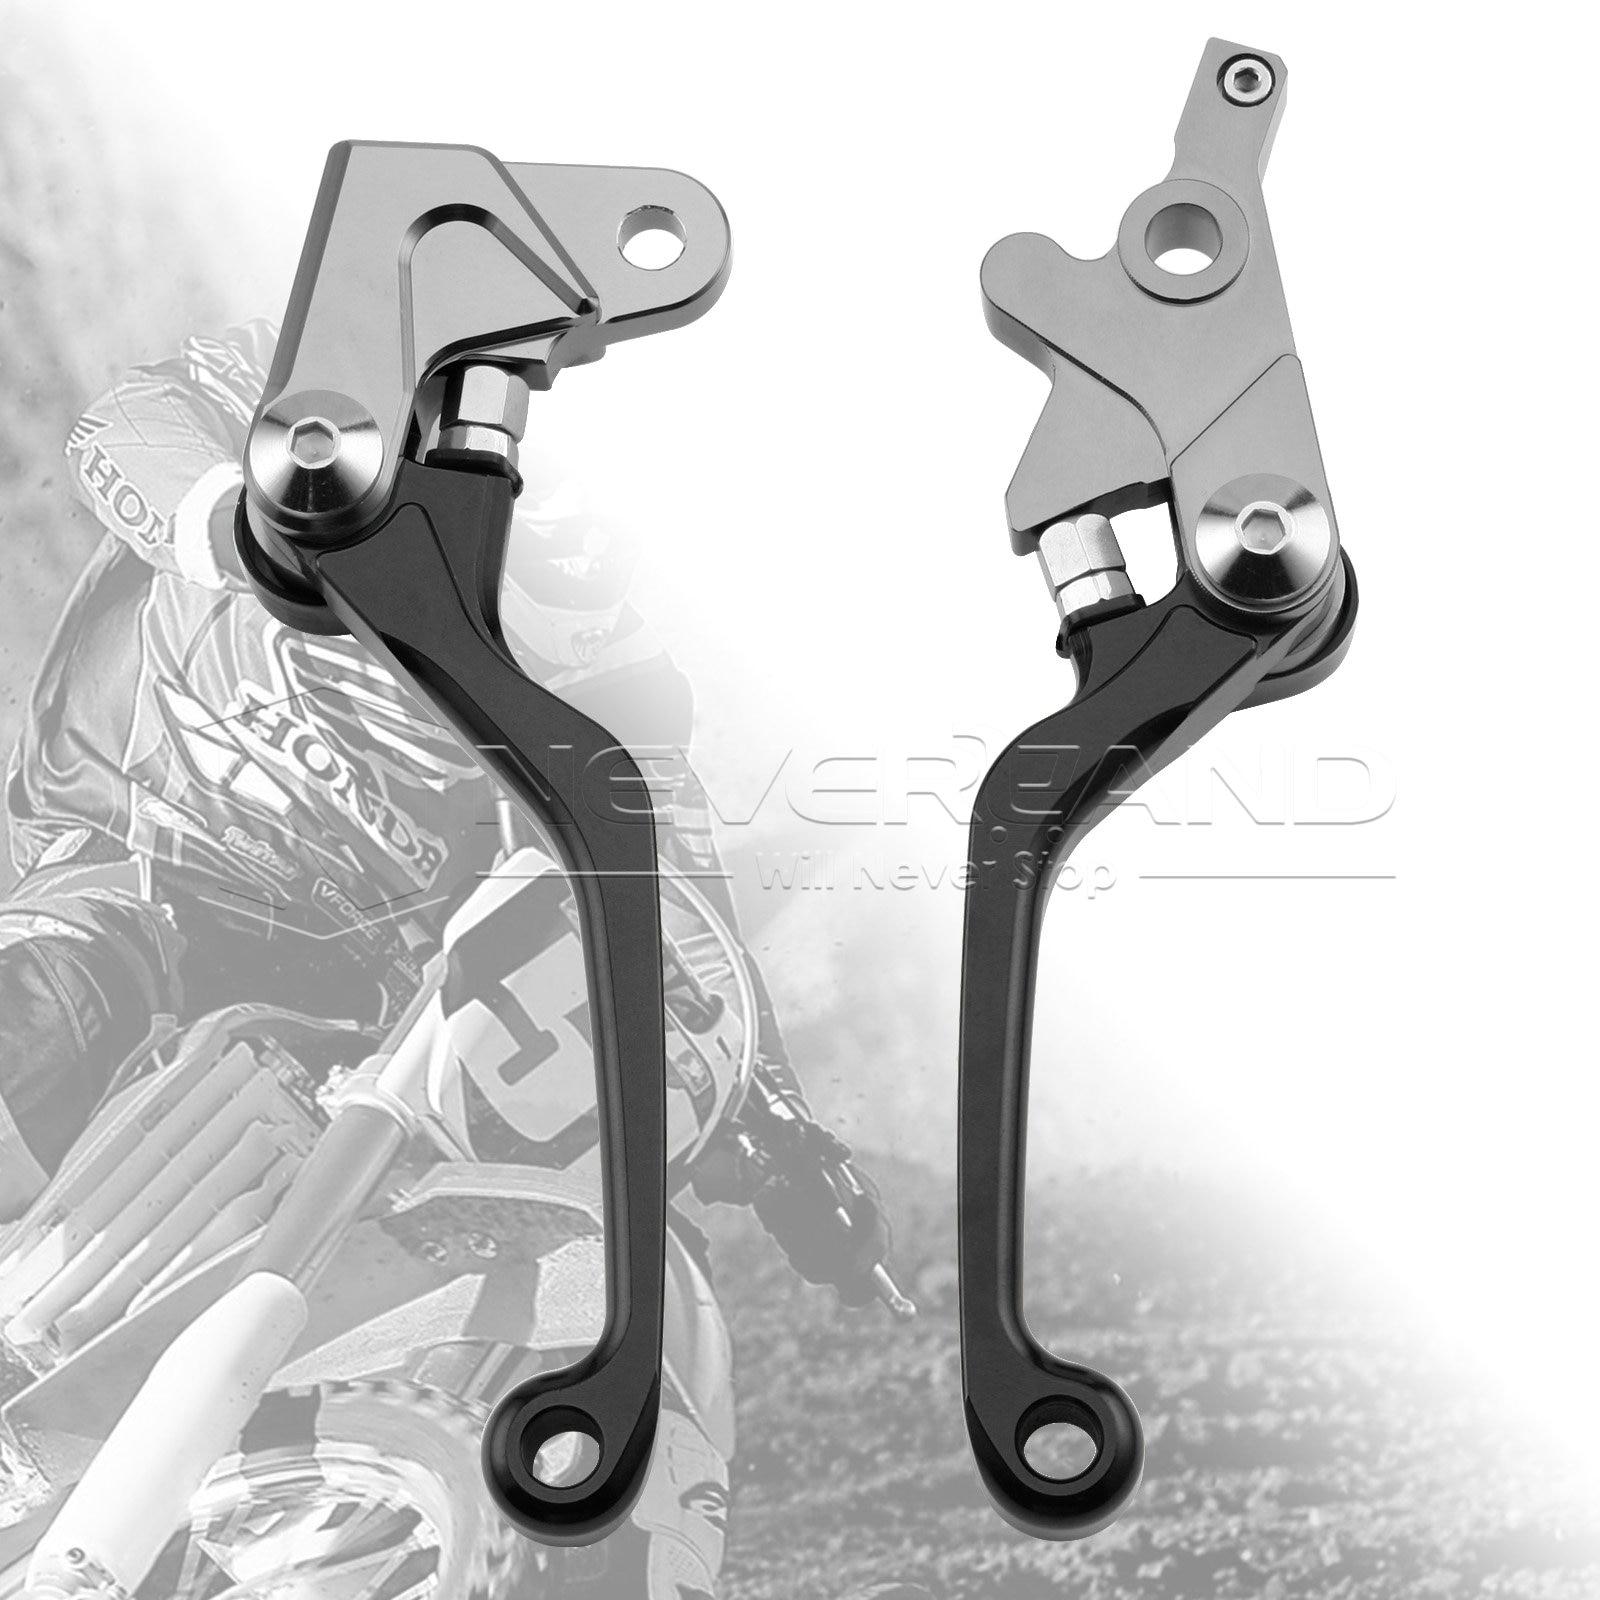 One Pair CNC Pivot Brake Clutch Levers For Honda XR250/MOTARD 95-07 XR400MOTARD 05-08 CRM250R/AR 94-98 L01K/R05K Black D10 cnc dirt bike flex pivot brake clutch levers for honda crm250r ar xr250 400 motard